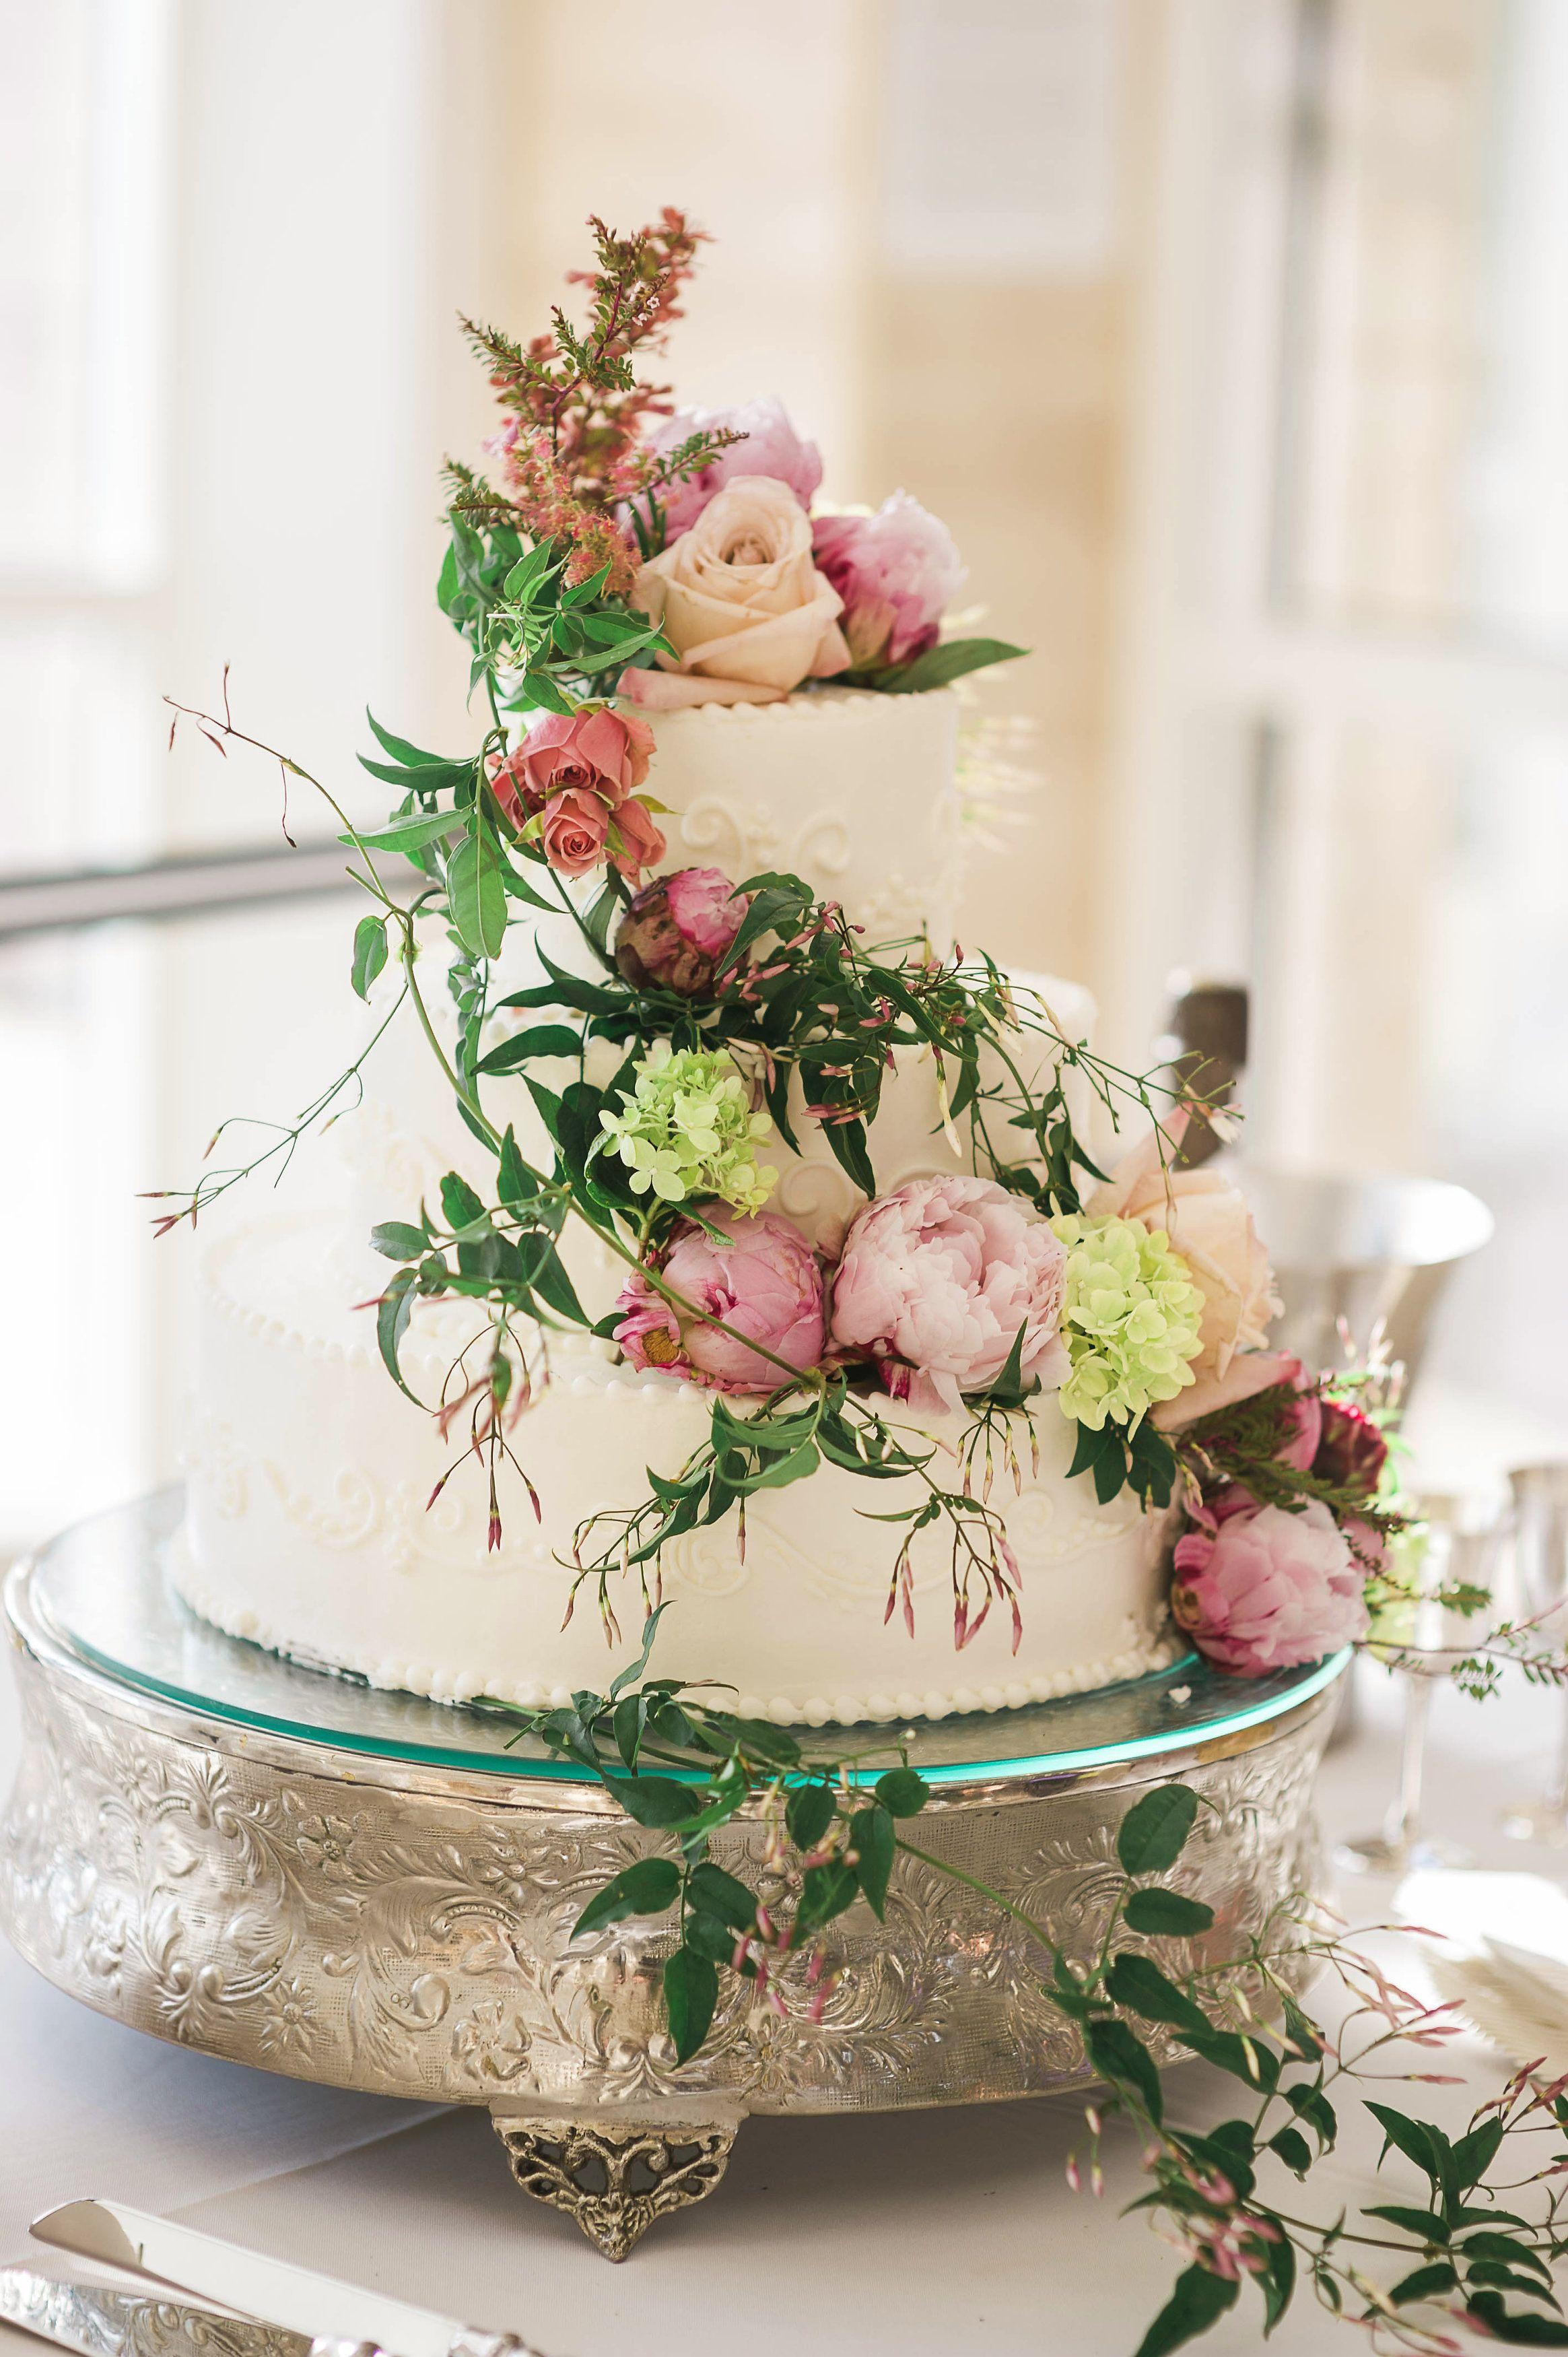 Wedding cake garden style flowers with jasmine, peonies ...